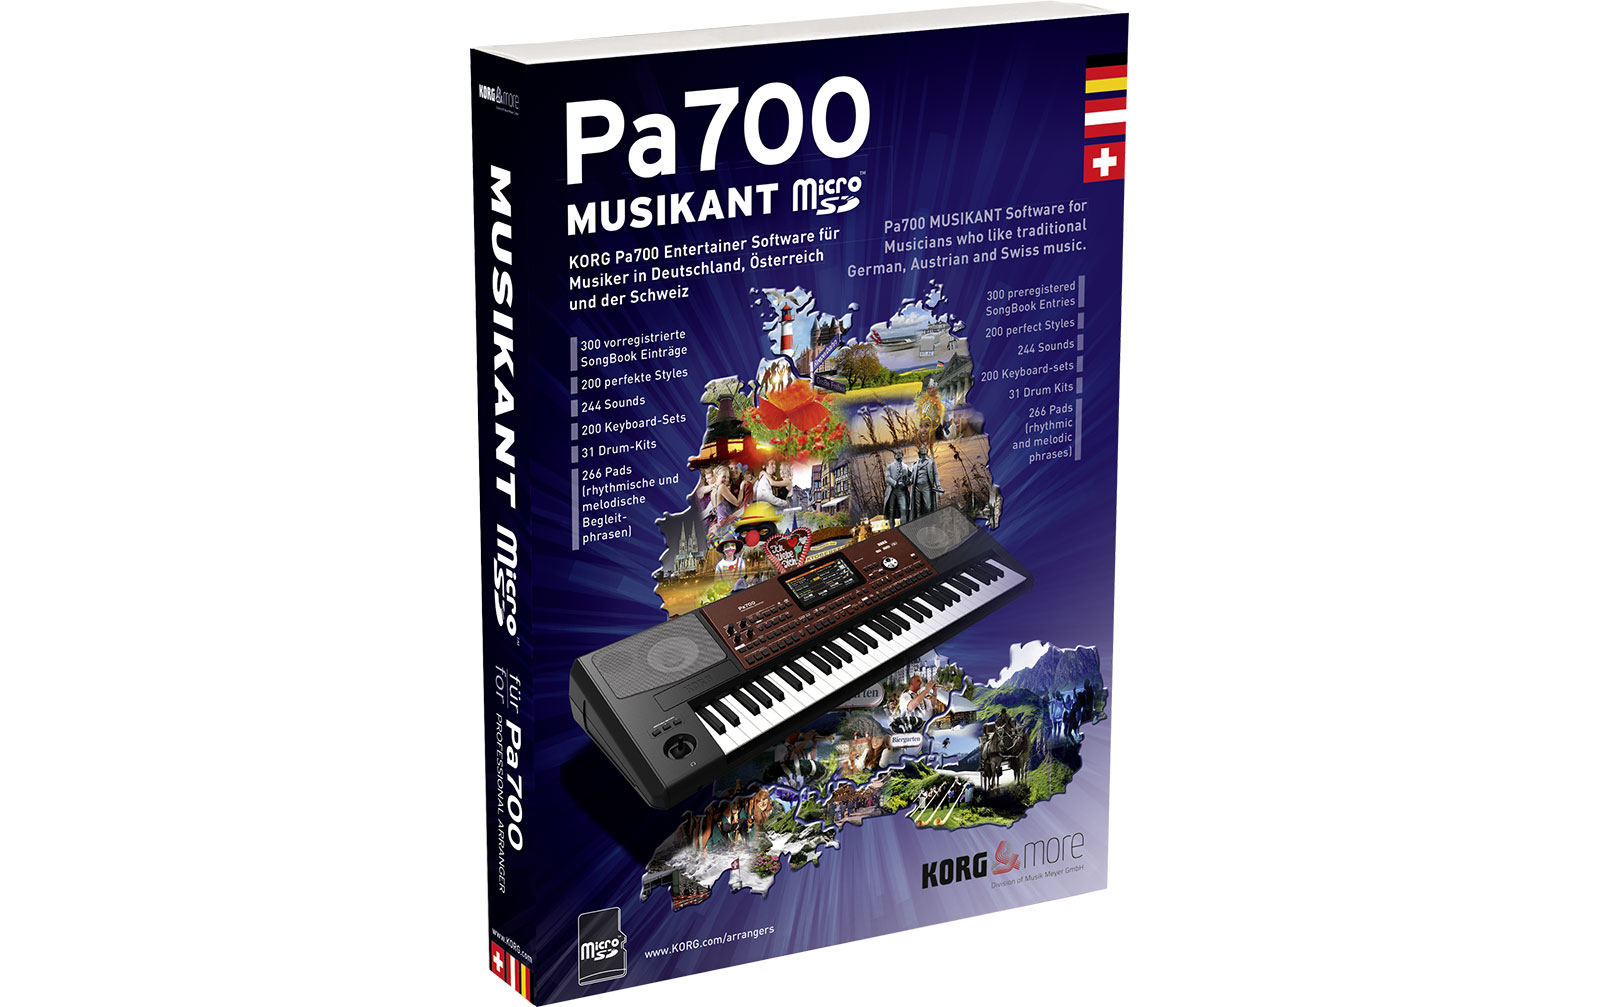 korg-musikant-fa-r-pa700-software-mit-micro-sd-karte